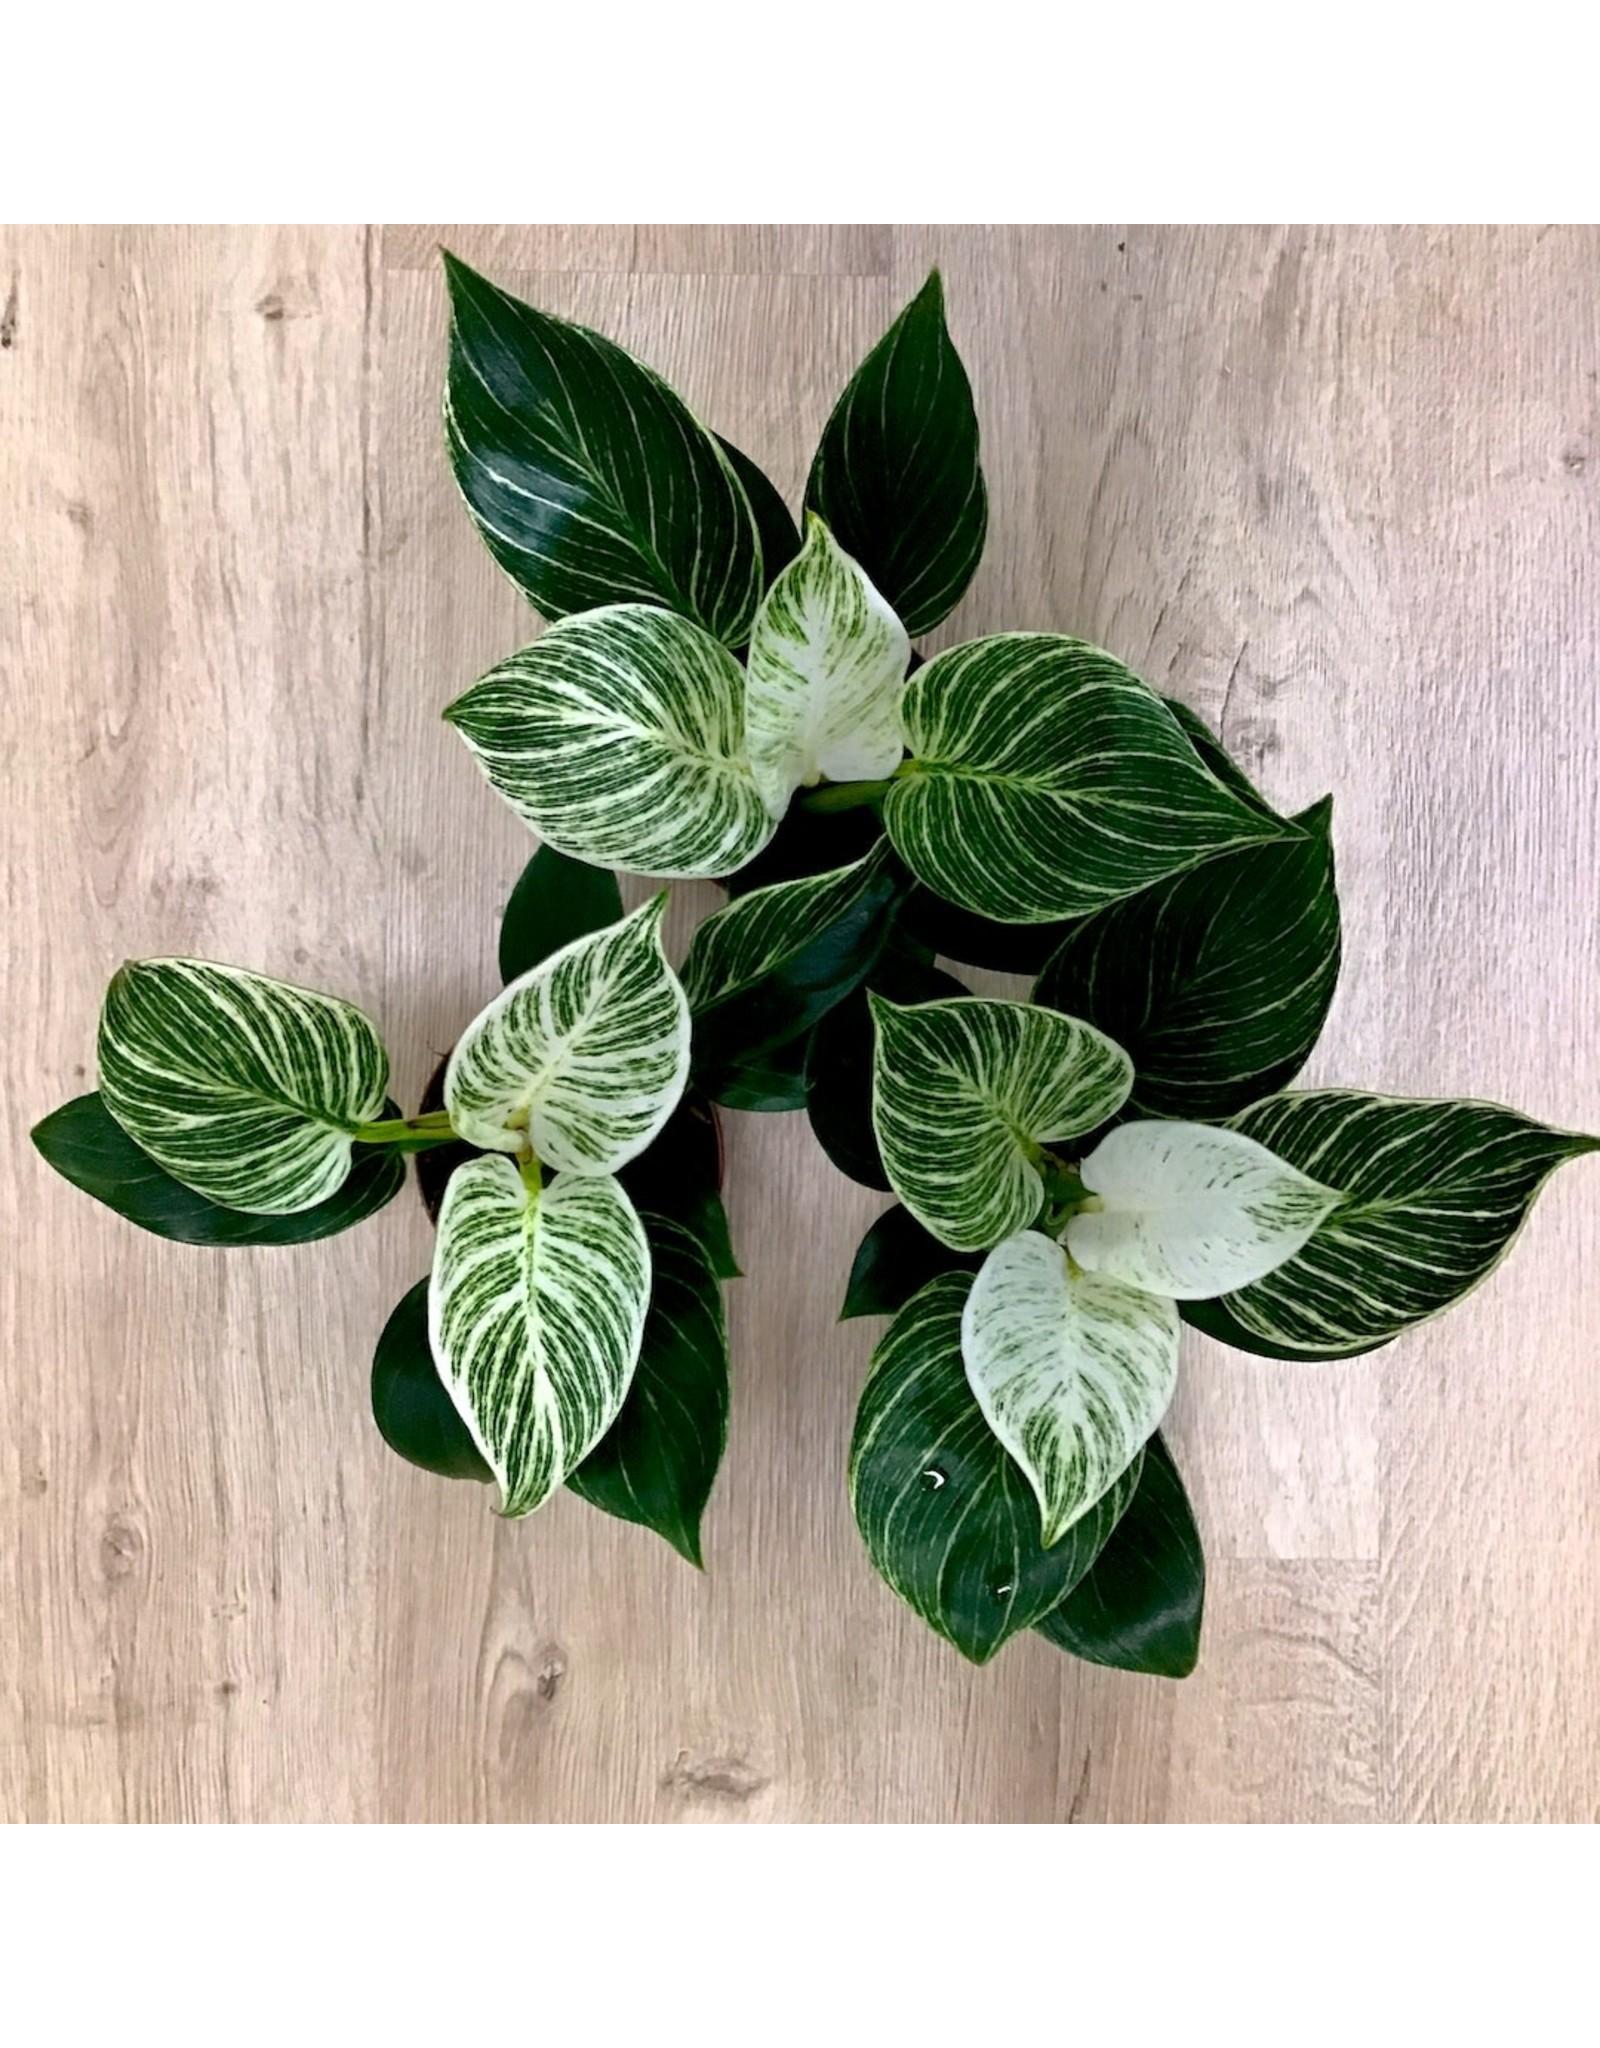 NLS Philodendron Birkin